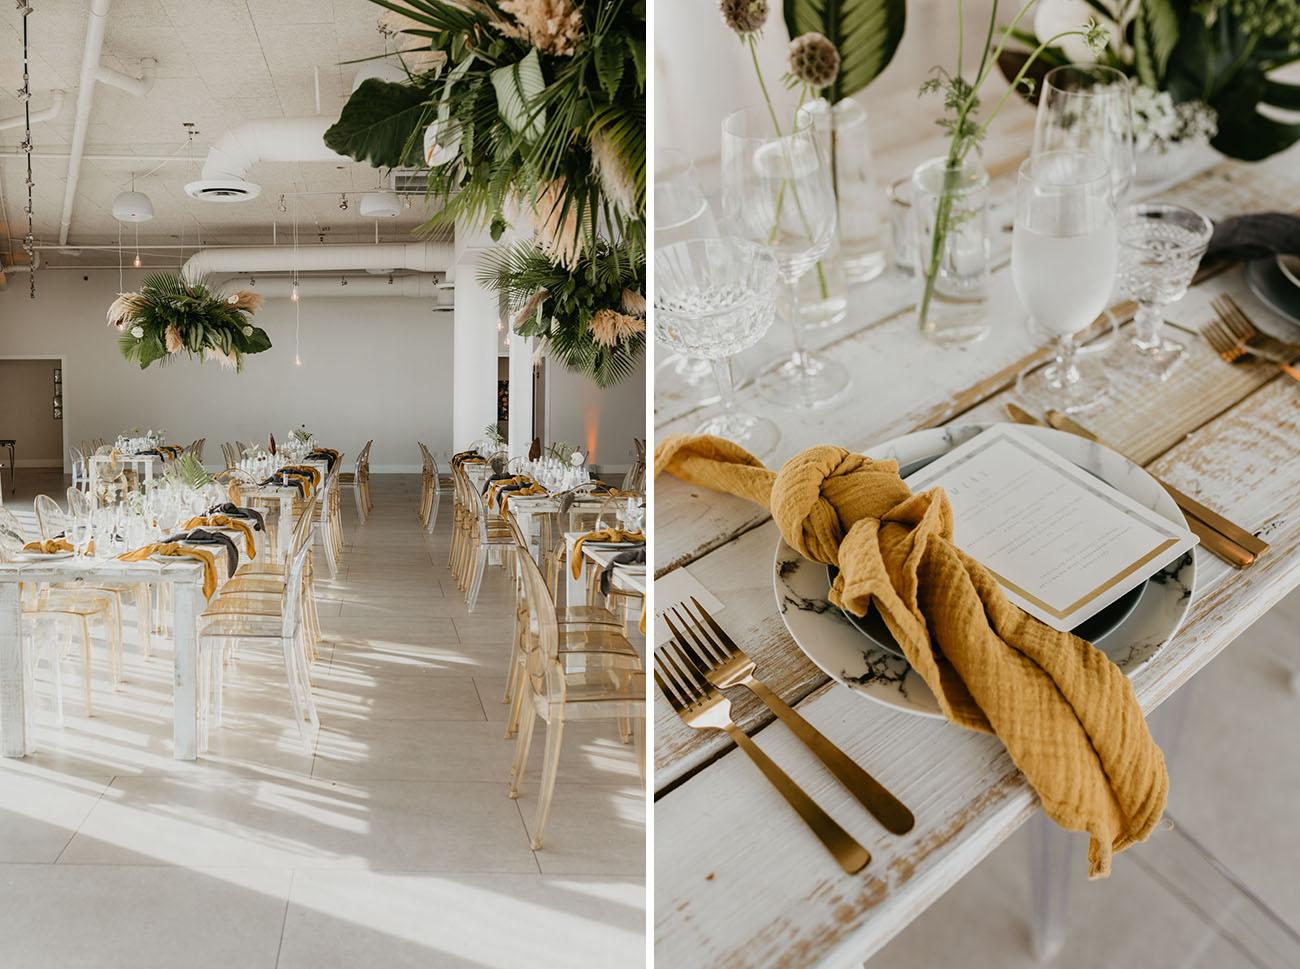 Tropical Florida Rooftop Wedding